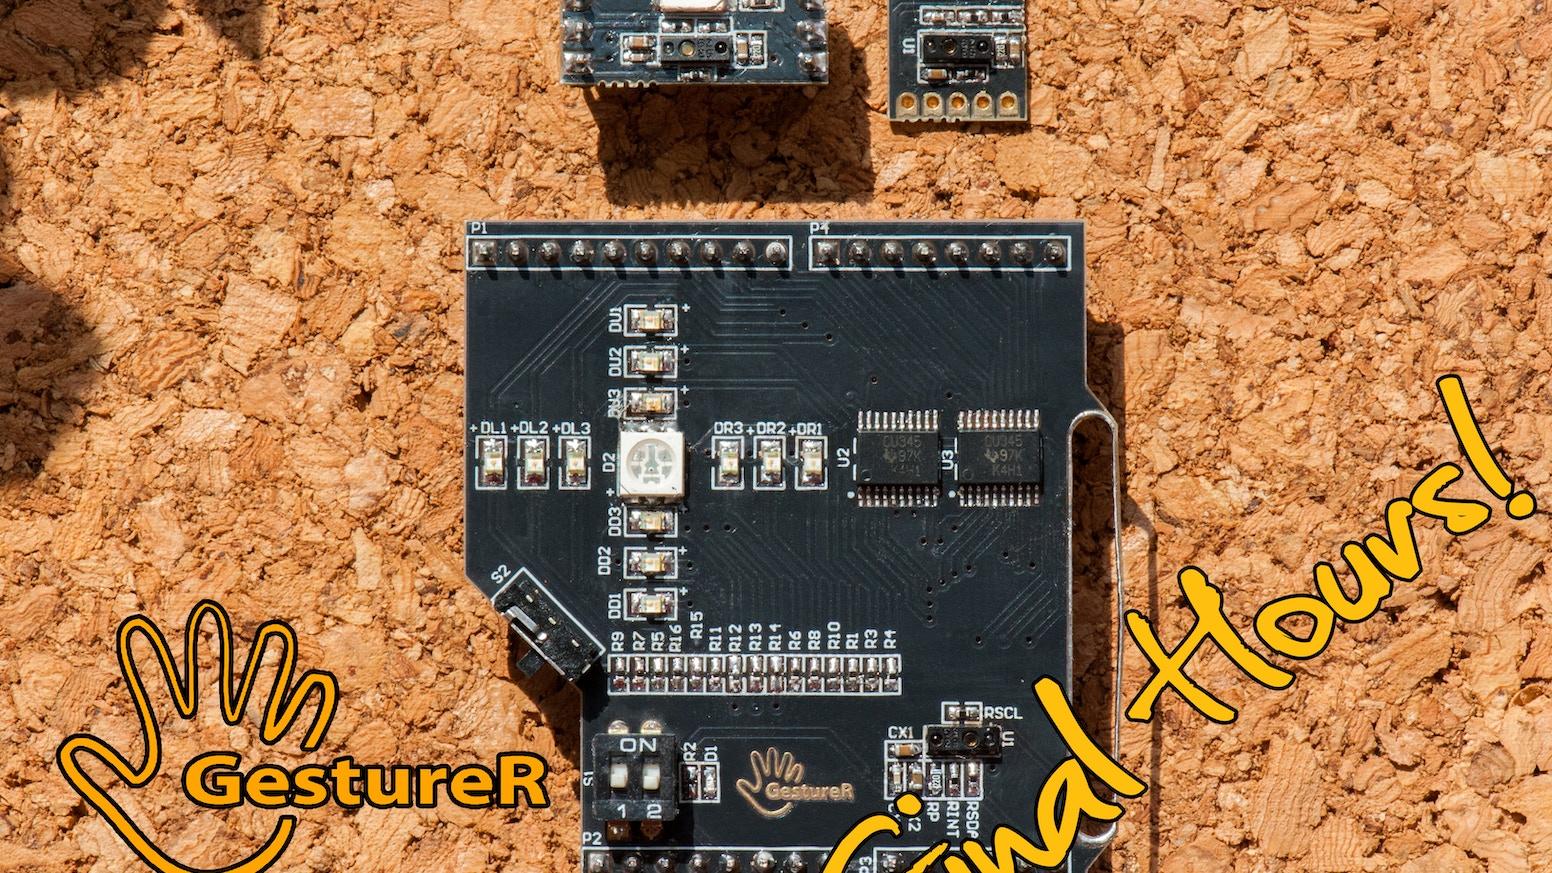 GestureR - Gesture Sensing, Proximity Sensing, Ambient Light Sensing in a single tiny module for Arduino